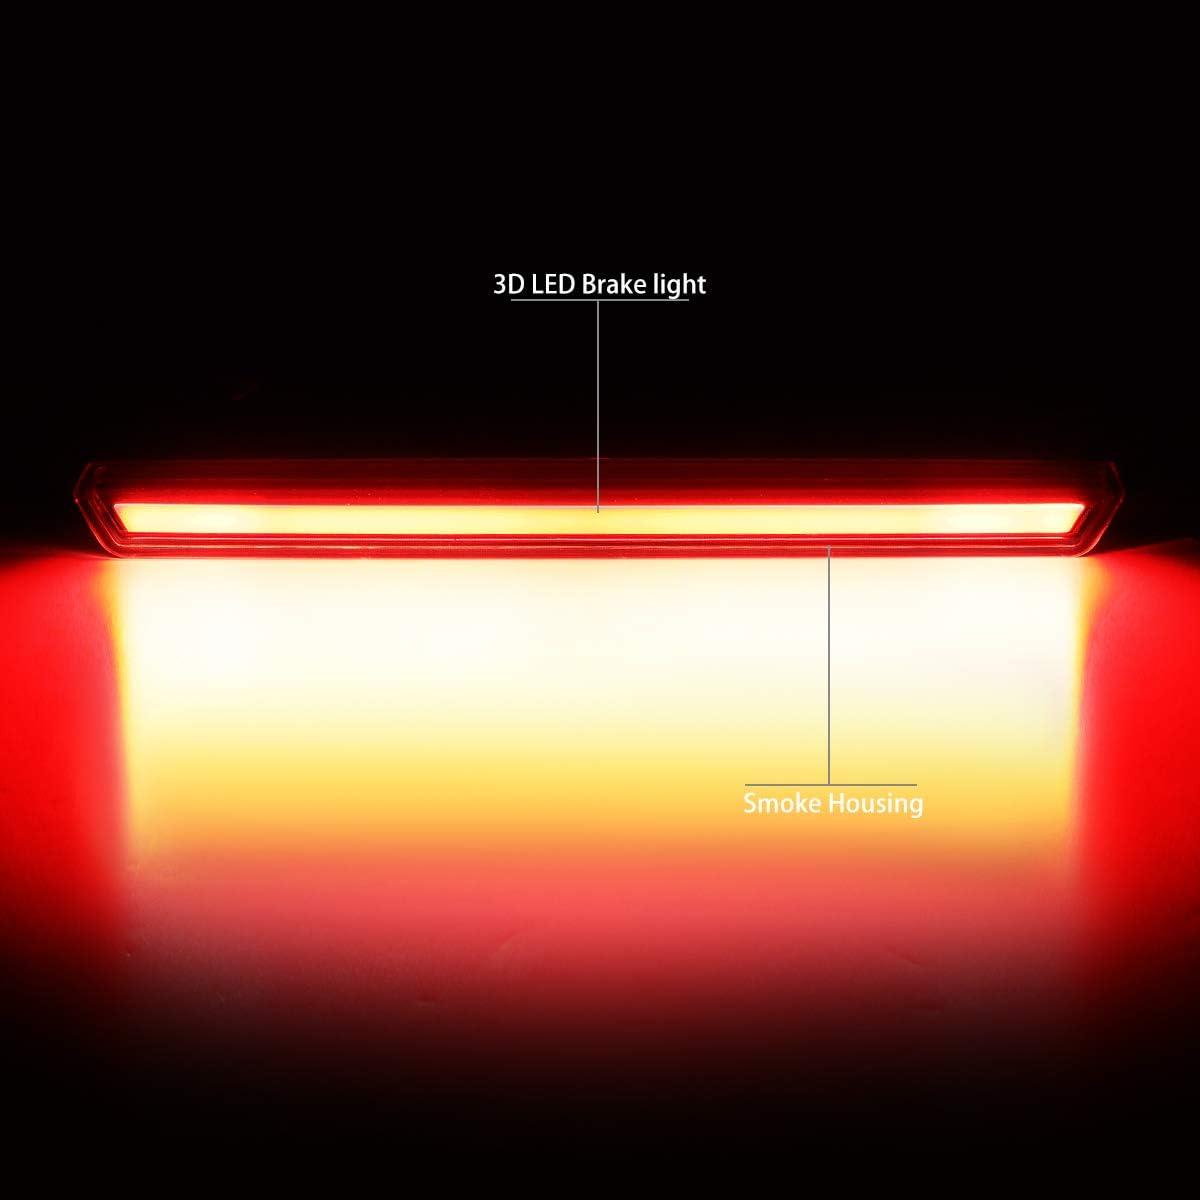 DNA Motoring 3BL-GMCD15-3D-LED-BK-SM 3D LED Bar Tube 3rd Third Tail Brake Light Replacement,Black Smoked